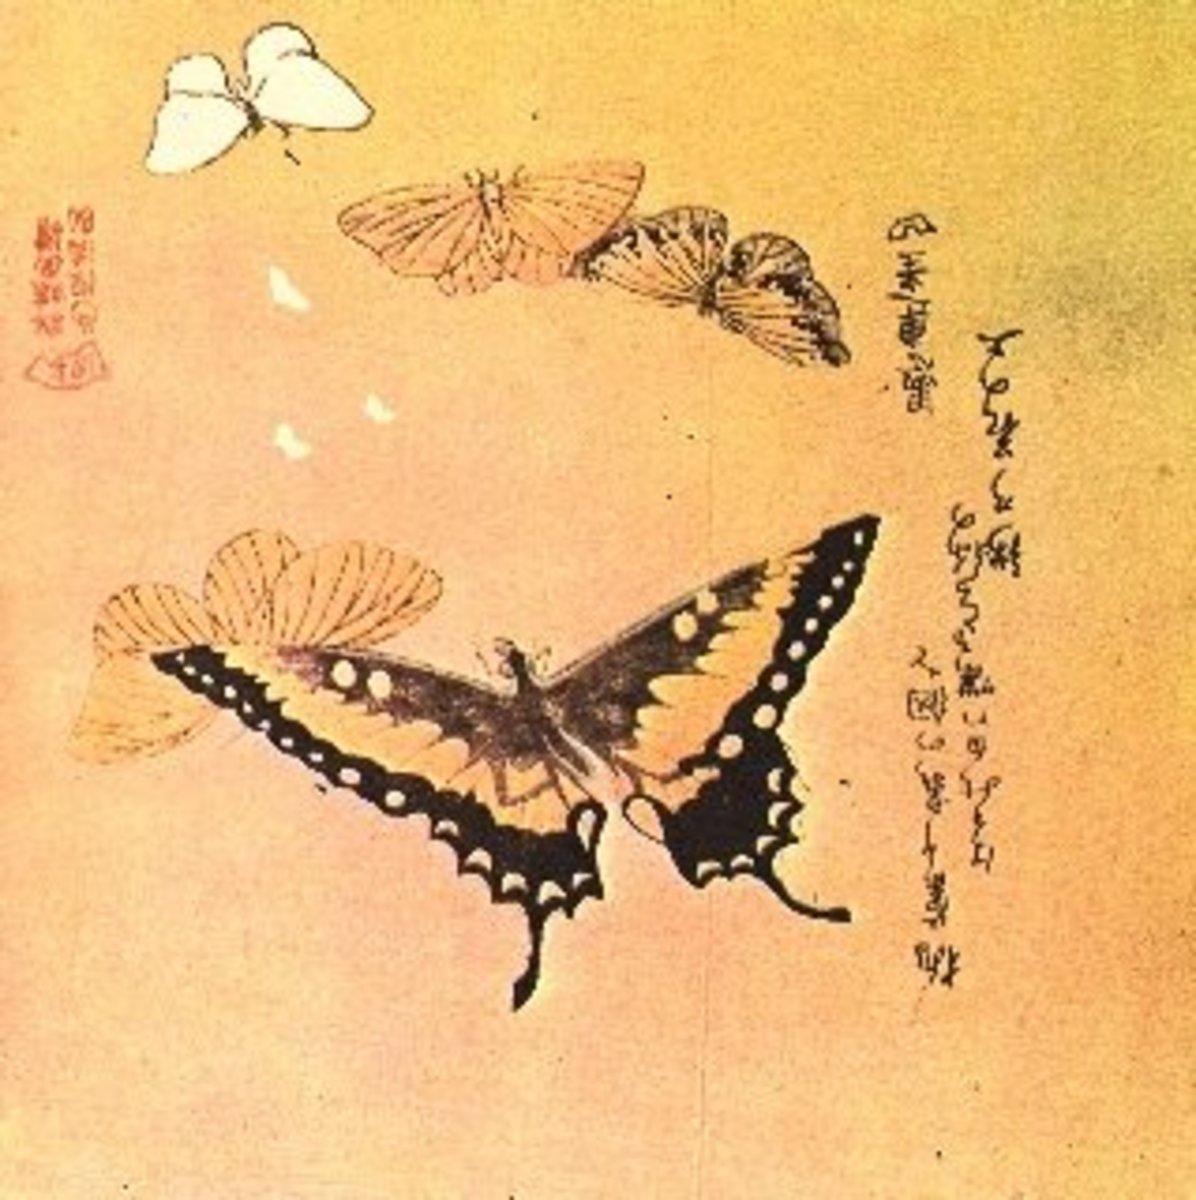 Butterfly print by Kudo Shunman (1757-1820).